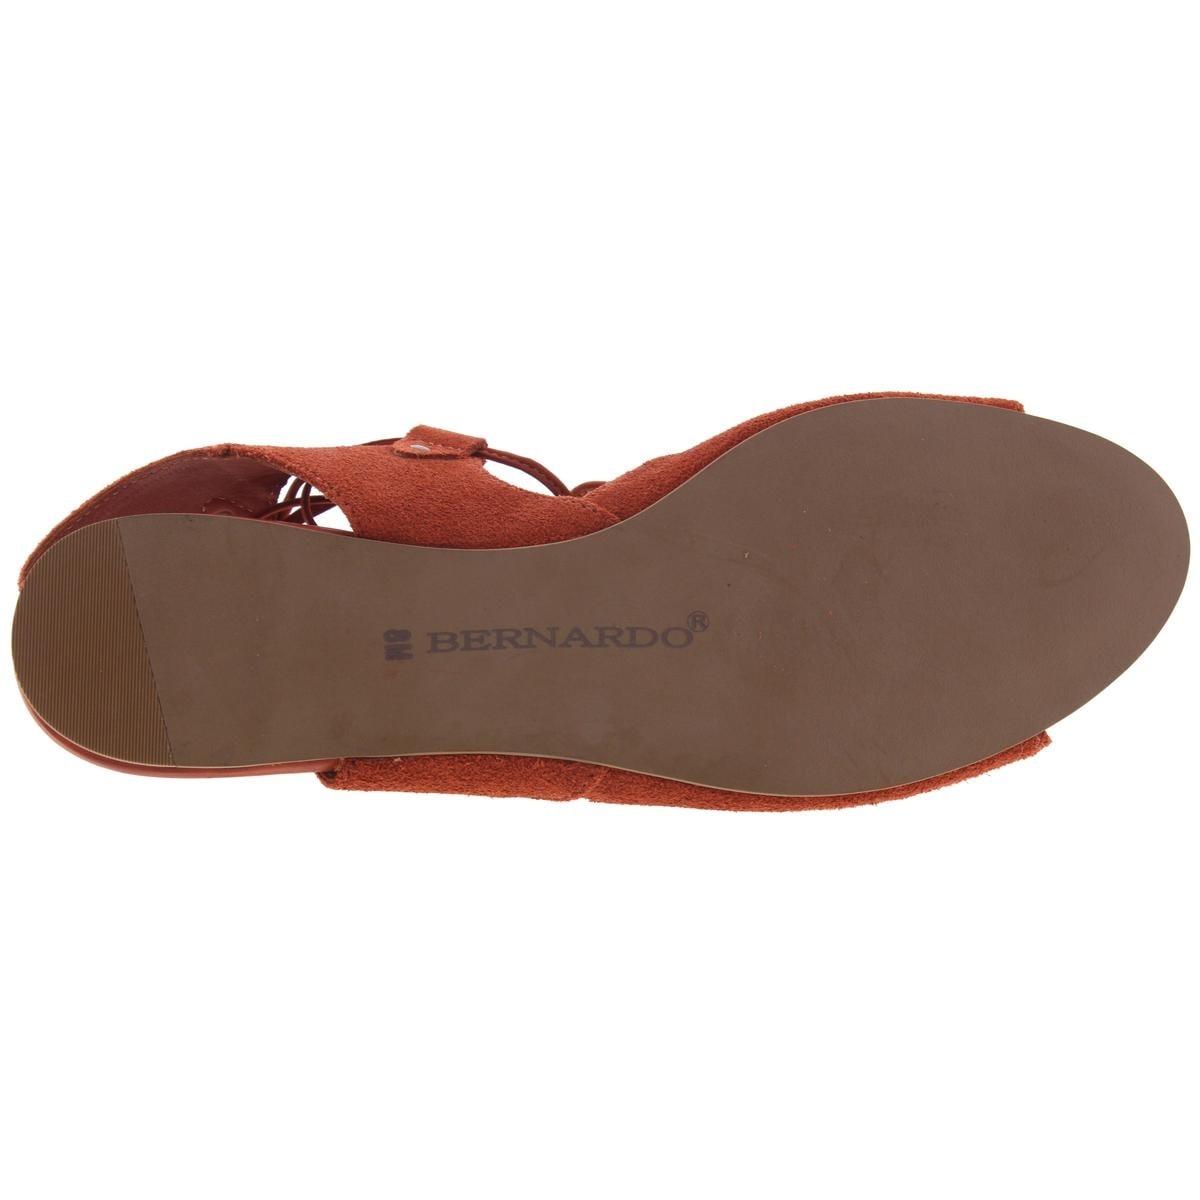 d32c581445f Shop Bernardo Womens Olivia Gladiator Sandals Suede Flat - 8 medium ...